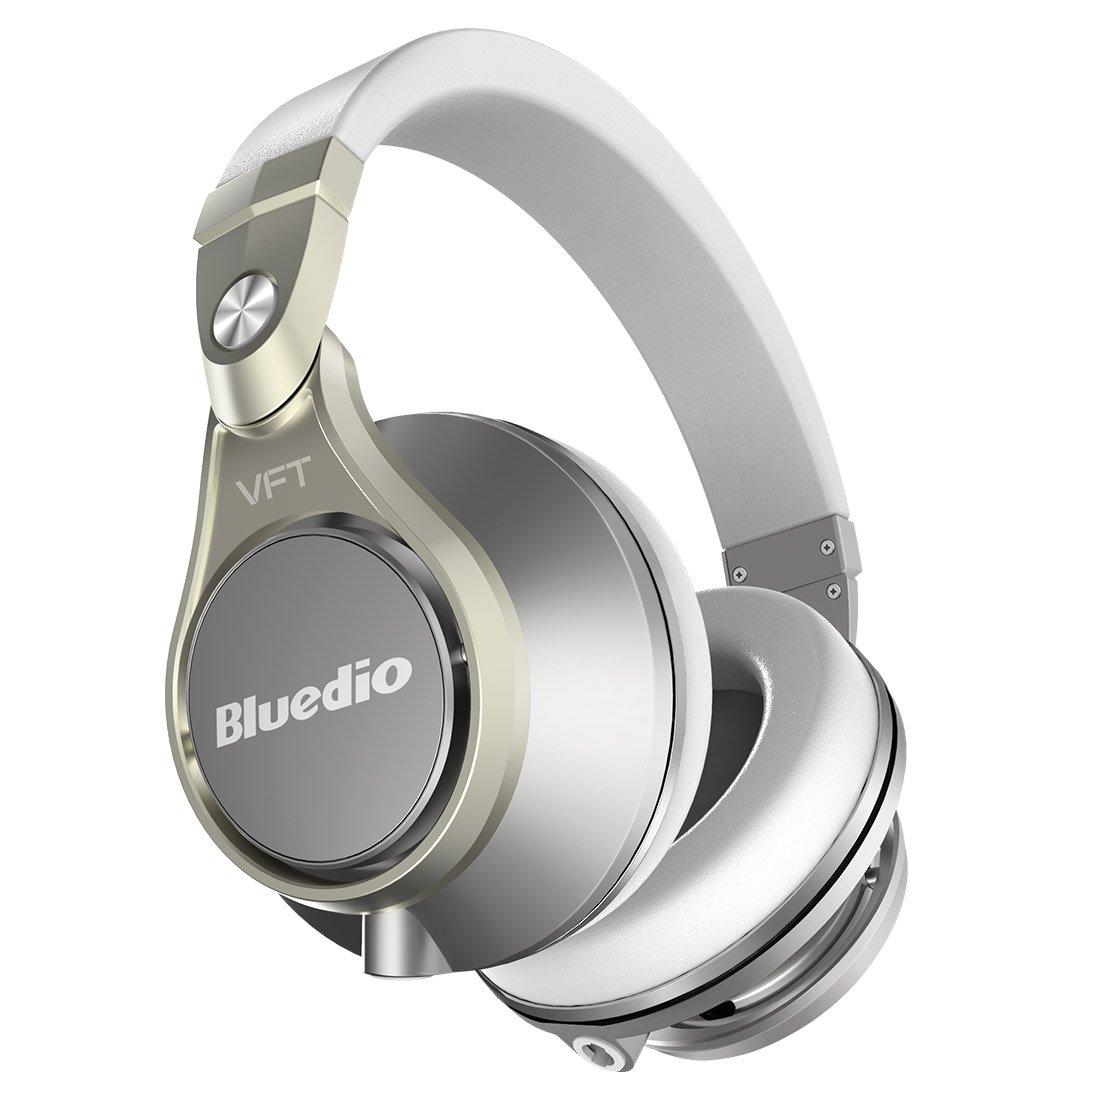 Bluedio U PLUS (UFO) Pro Extra Bass Auricolari Cuffie Bluetooth Brevettato PPS12 Drivers Over-Ear Cuffie DJ (Champagne Bianco)